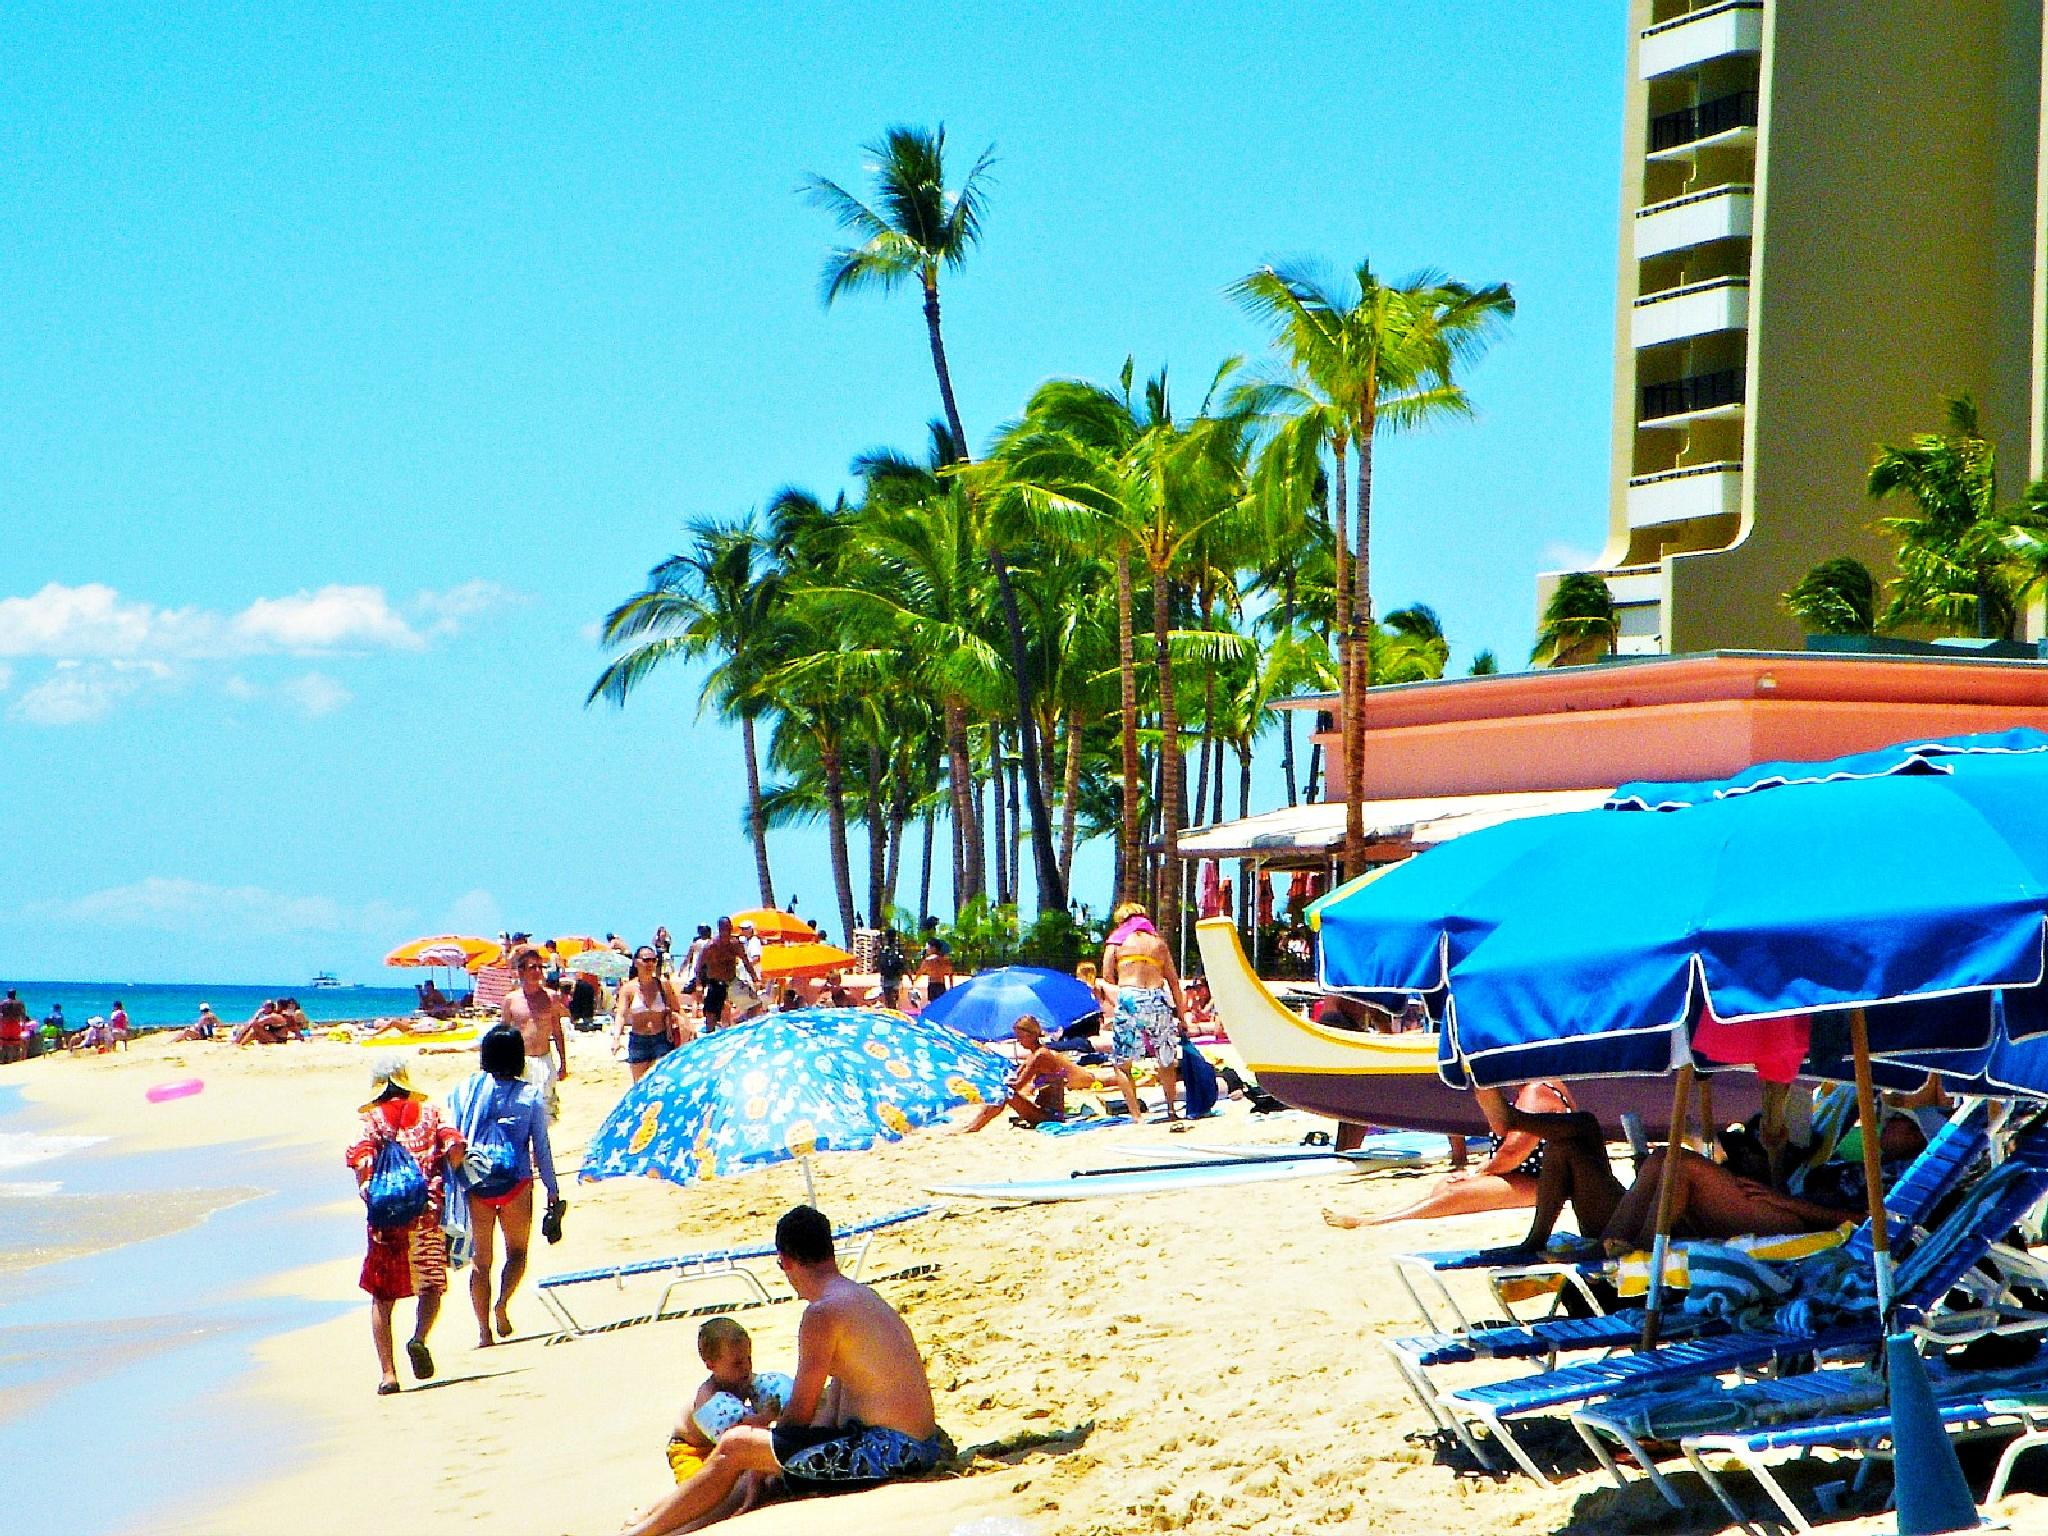 Waikiki Beach by Laura J. Vazquez